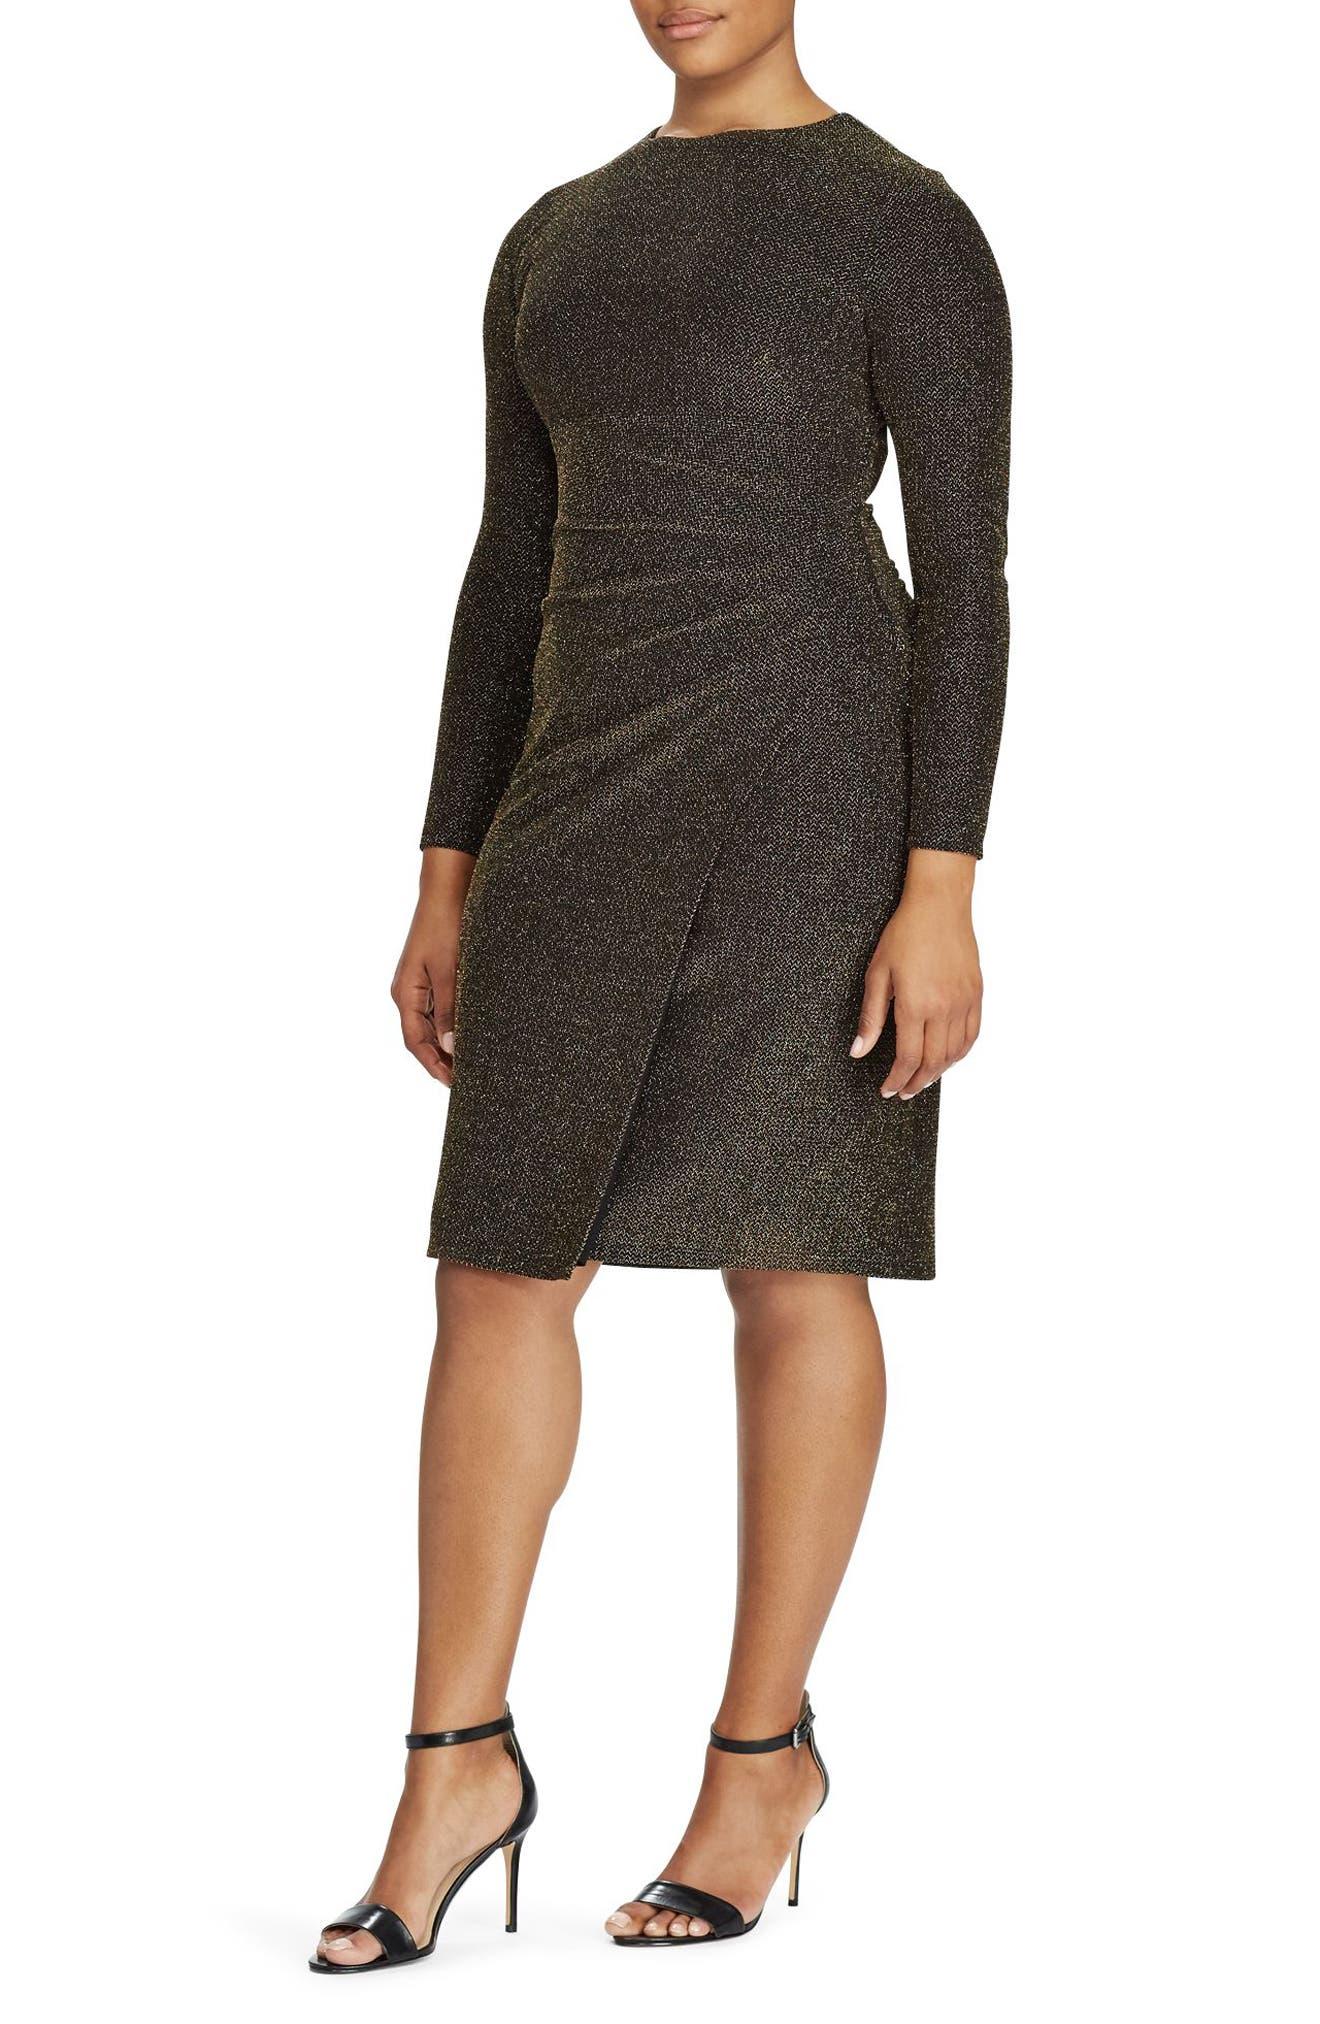 Lauren Ralph Lauren Metallic Knit Faux Wrap Dress (Plus Size)